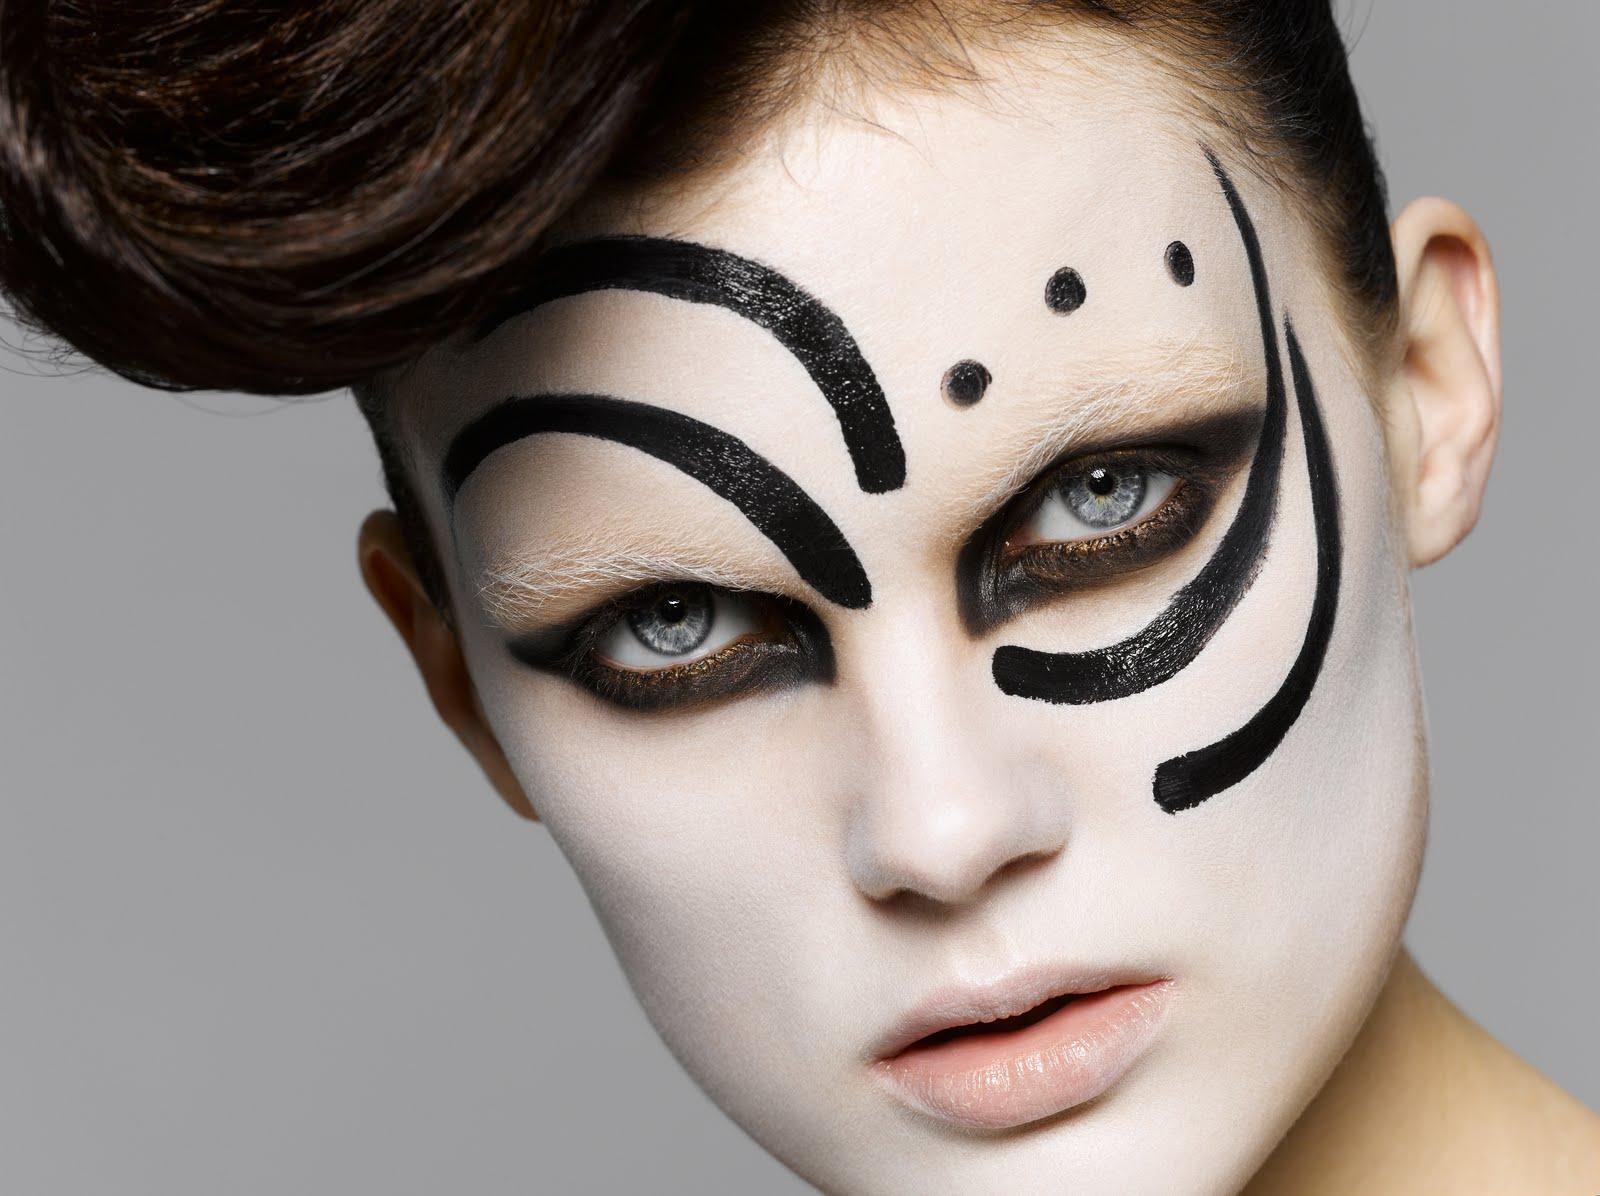 Trucco Halloween Facile.Trucco Halloween Fashion Idee Videotrucco